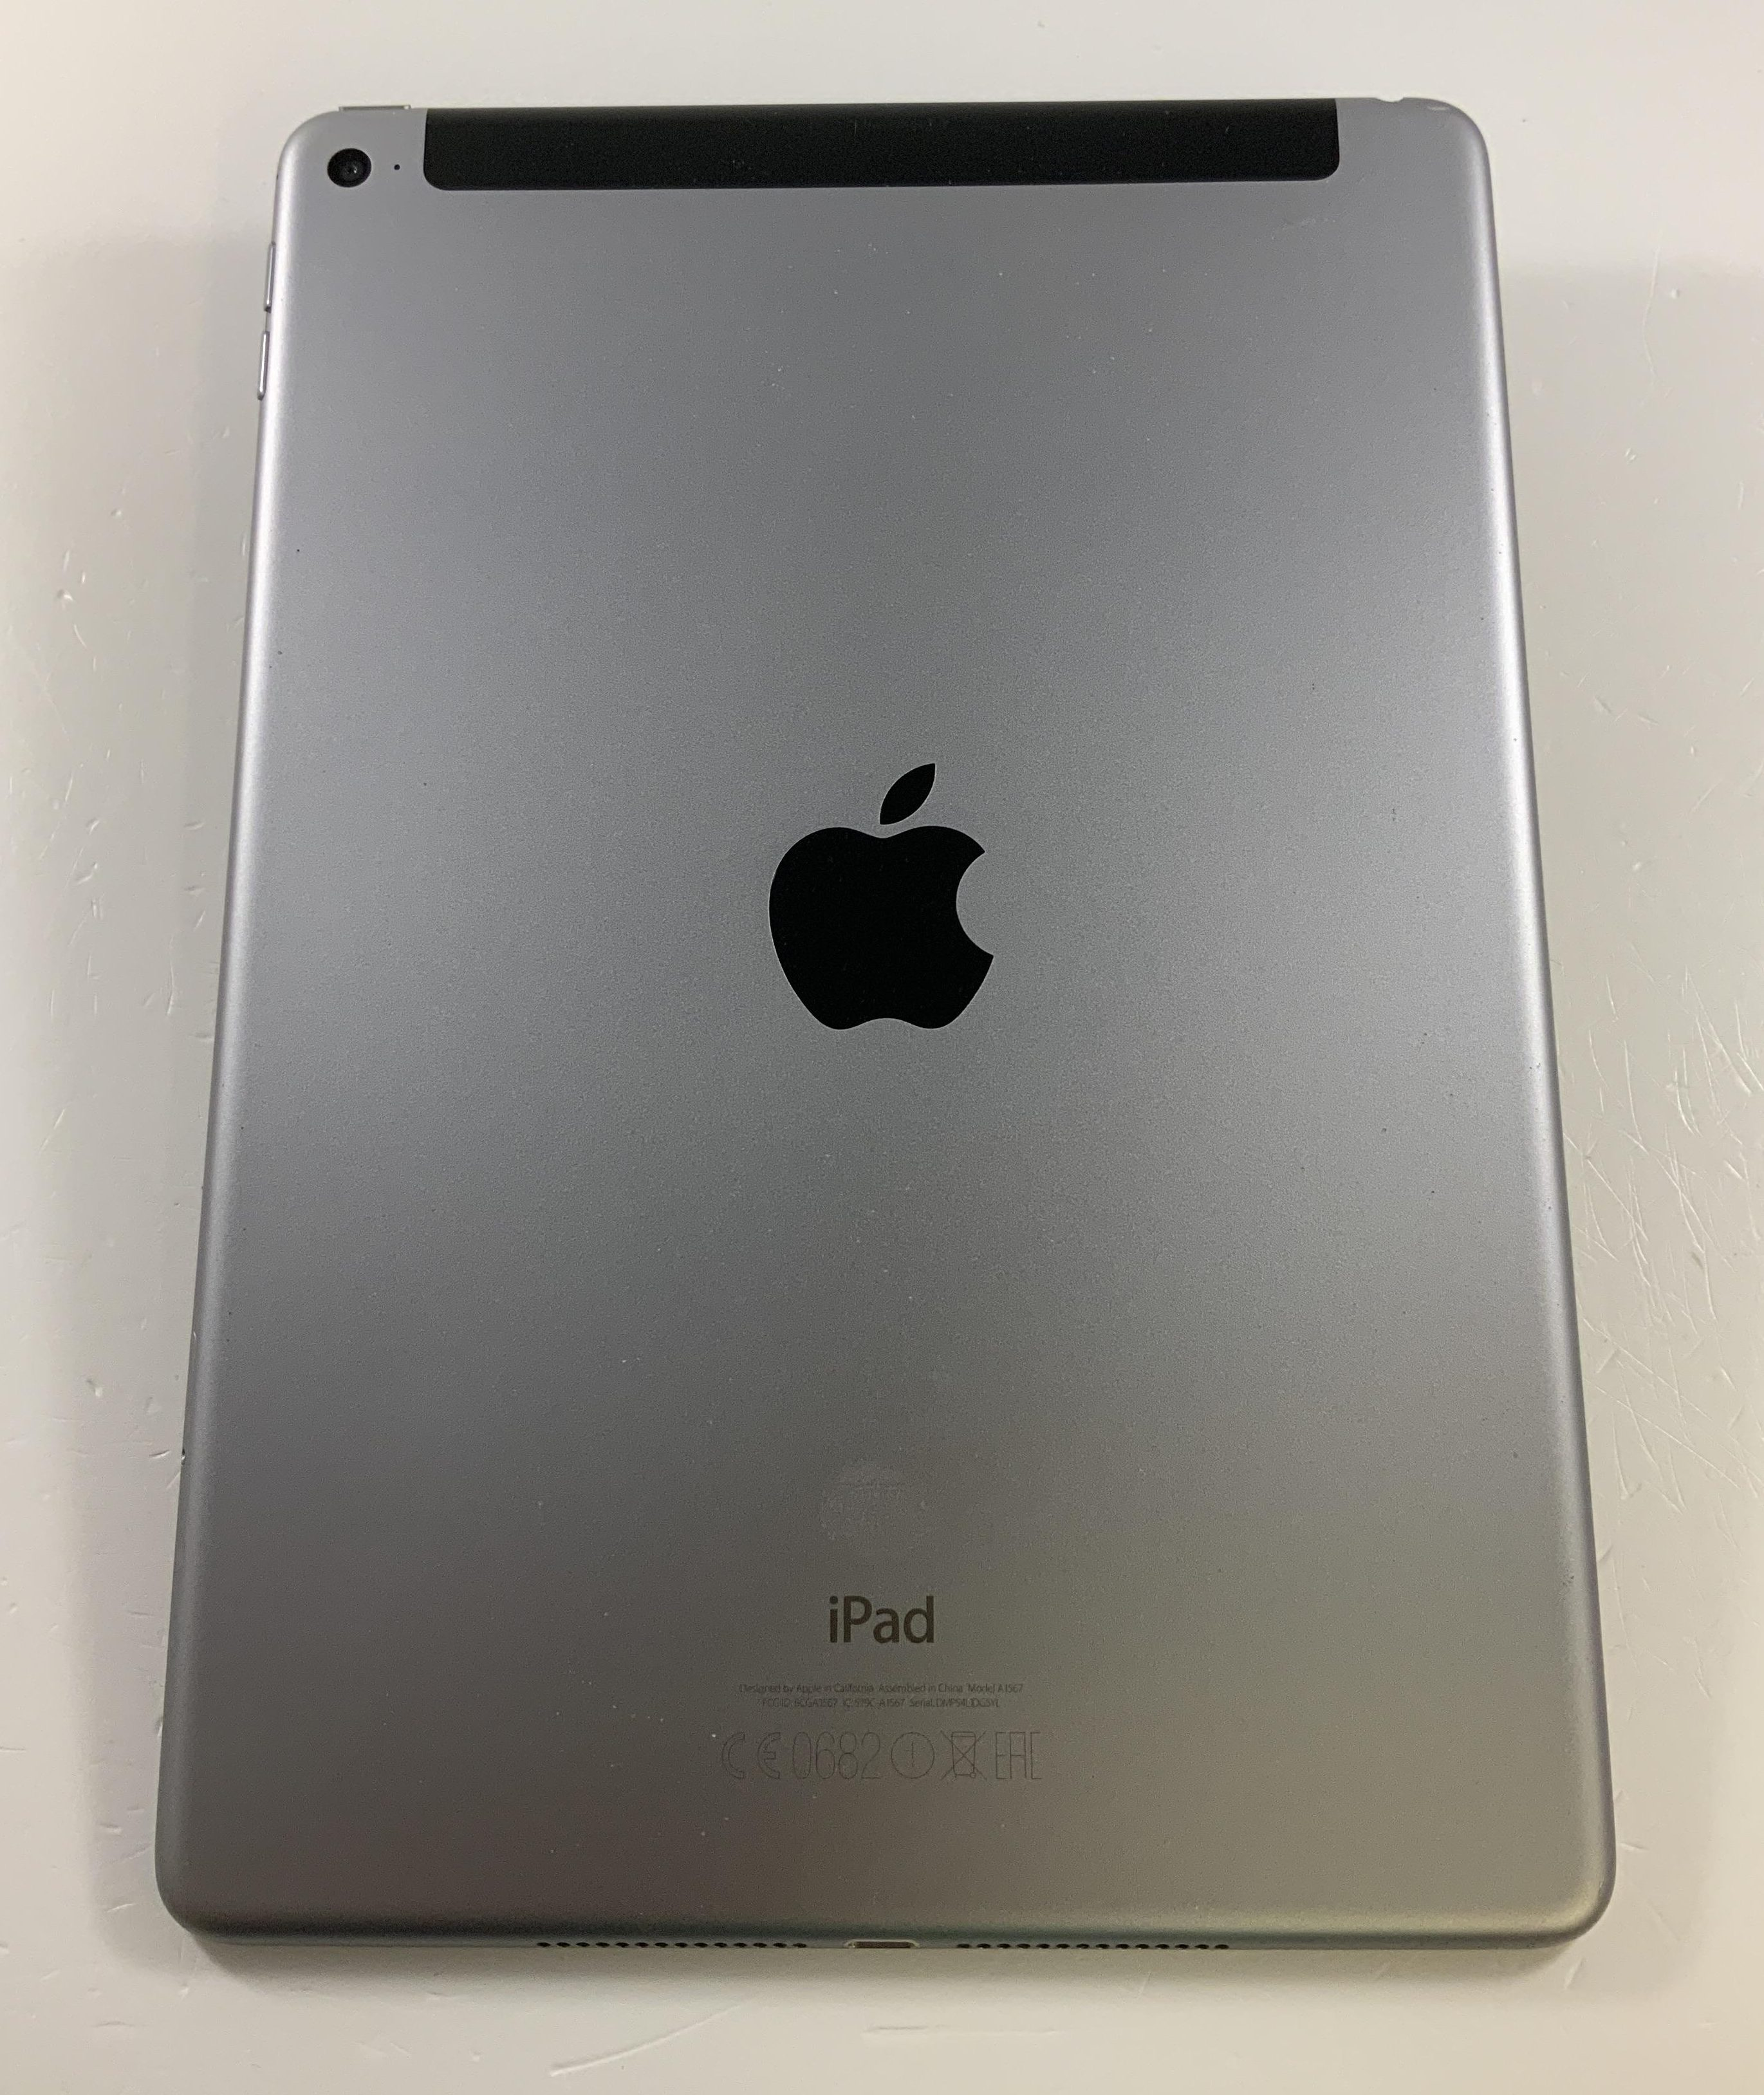 iPad Air 2 Wi-Fi + Cellular 64GB, 64GB, Space Gray, imagen 2